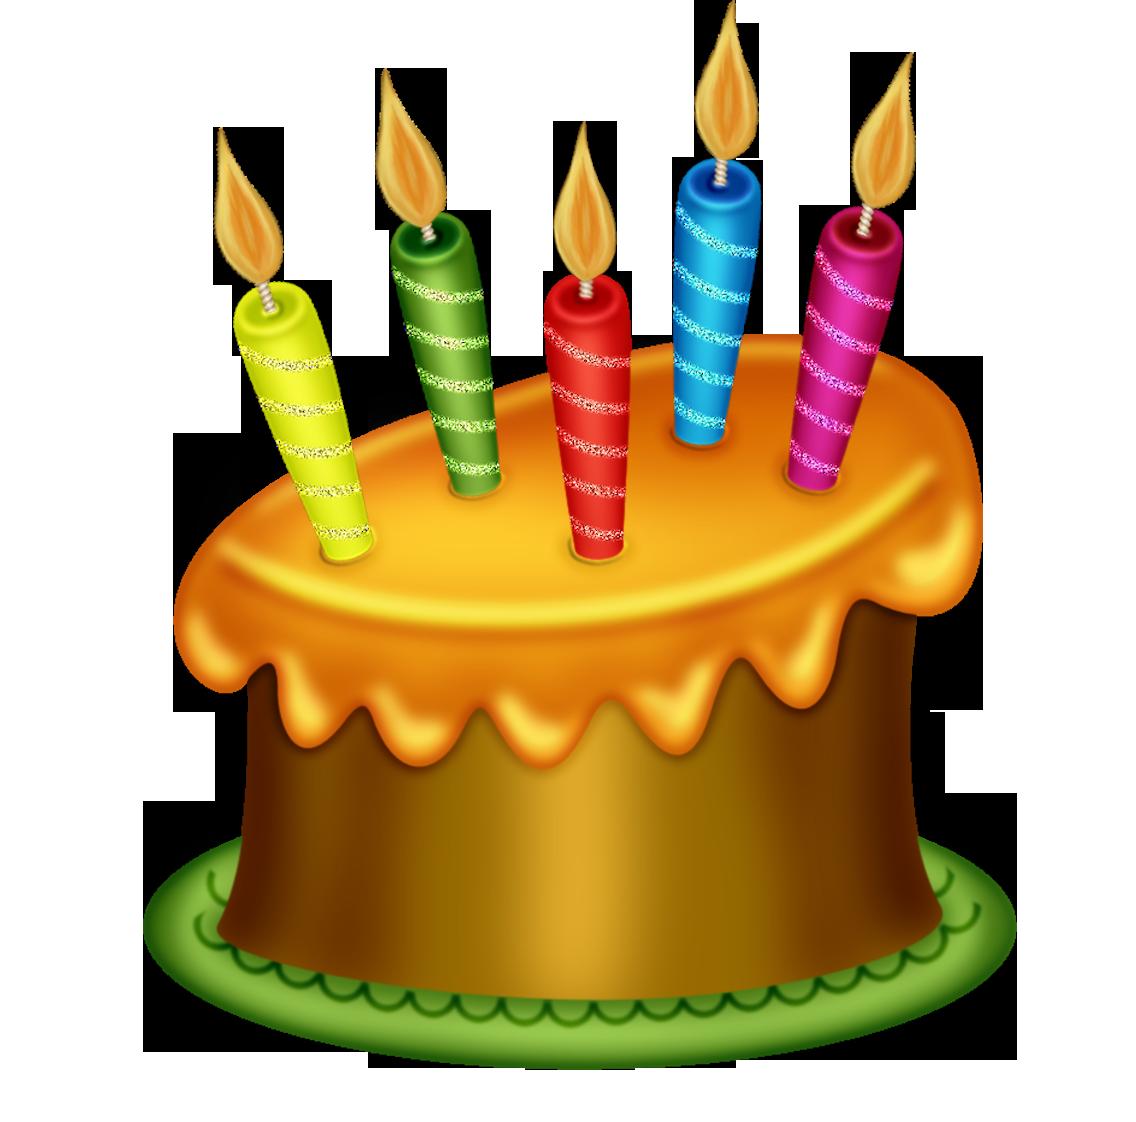 Cake birthday PNG - Cake PNG